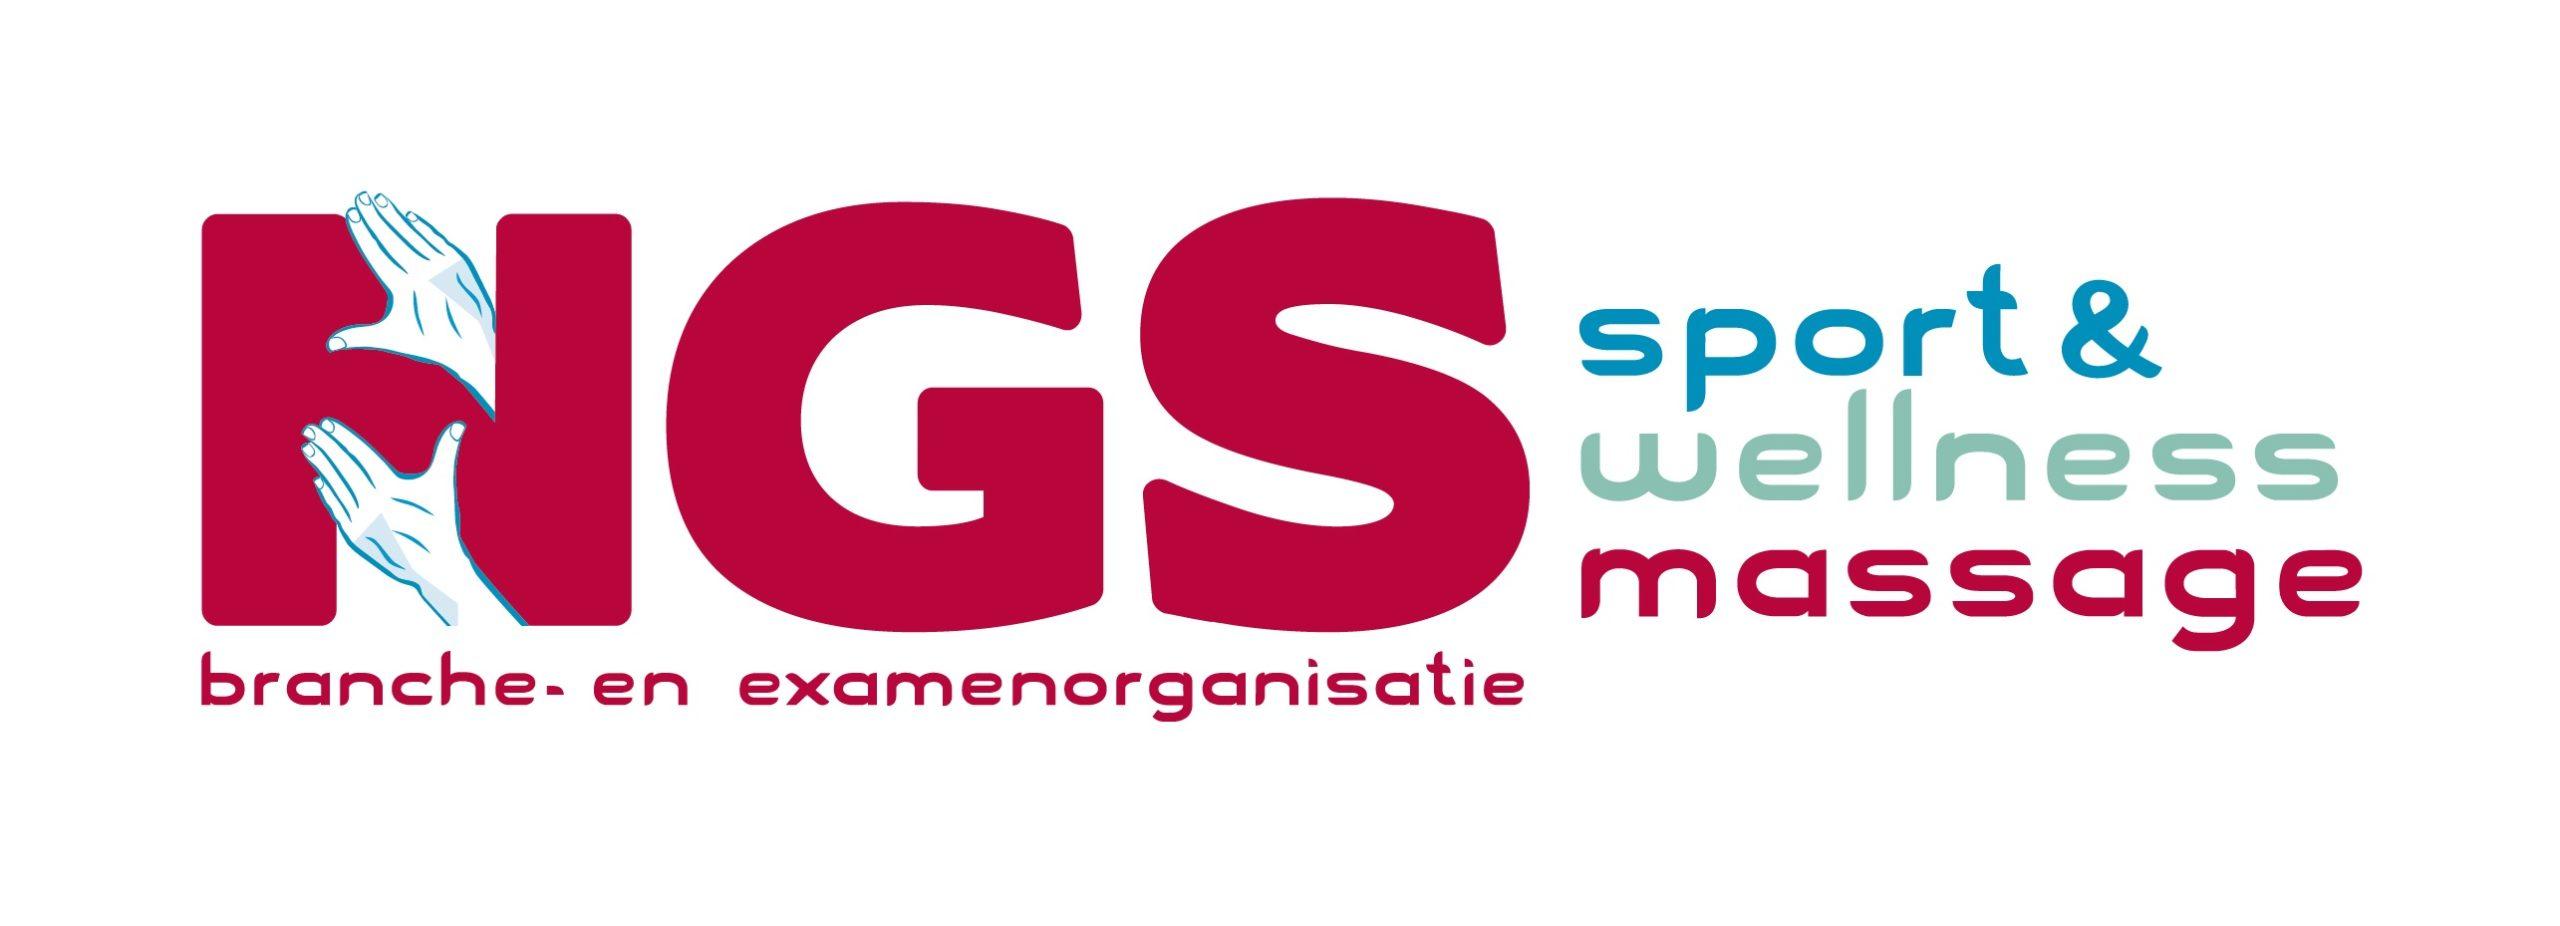 NGS Sportmassage tiel